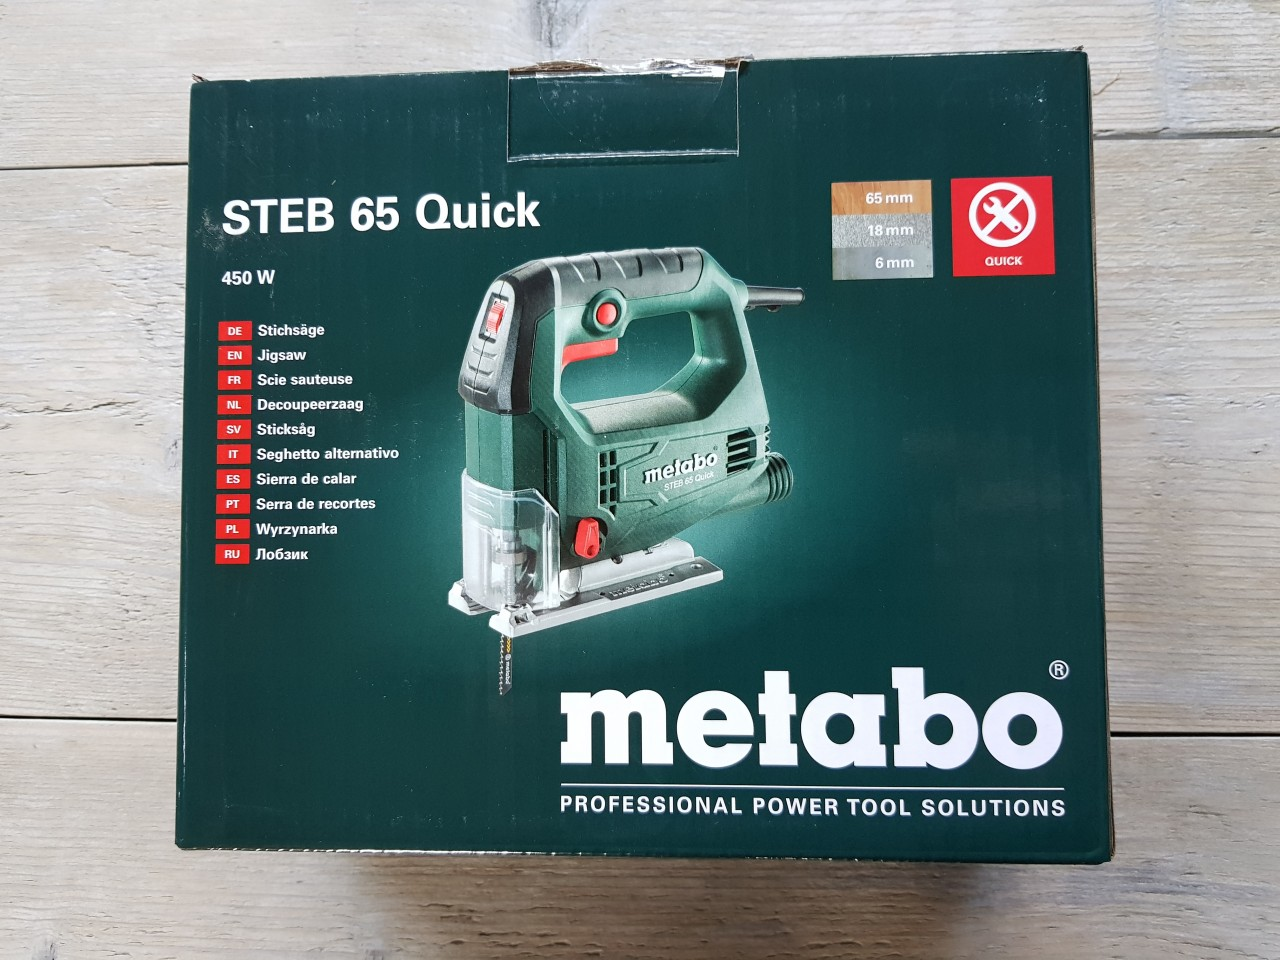 Metabo decoupeerzaag STEB 65 Quick Metabo decoupeerzaag STEB 65 Quick